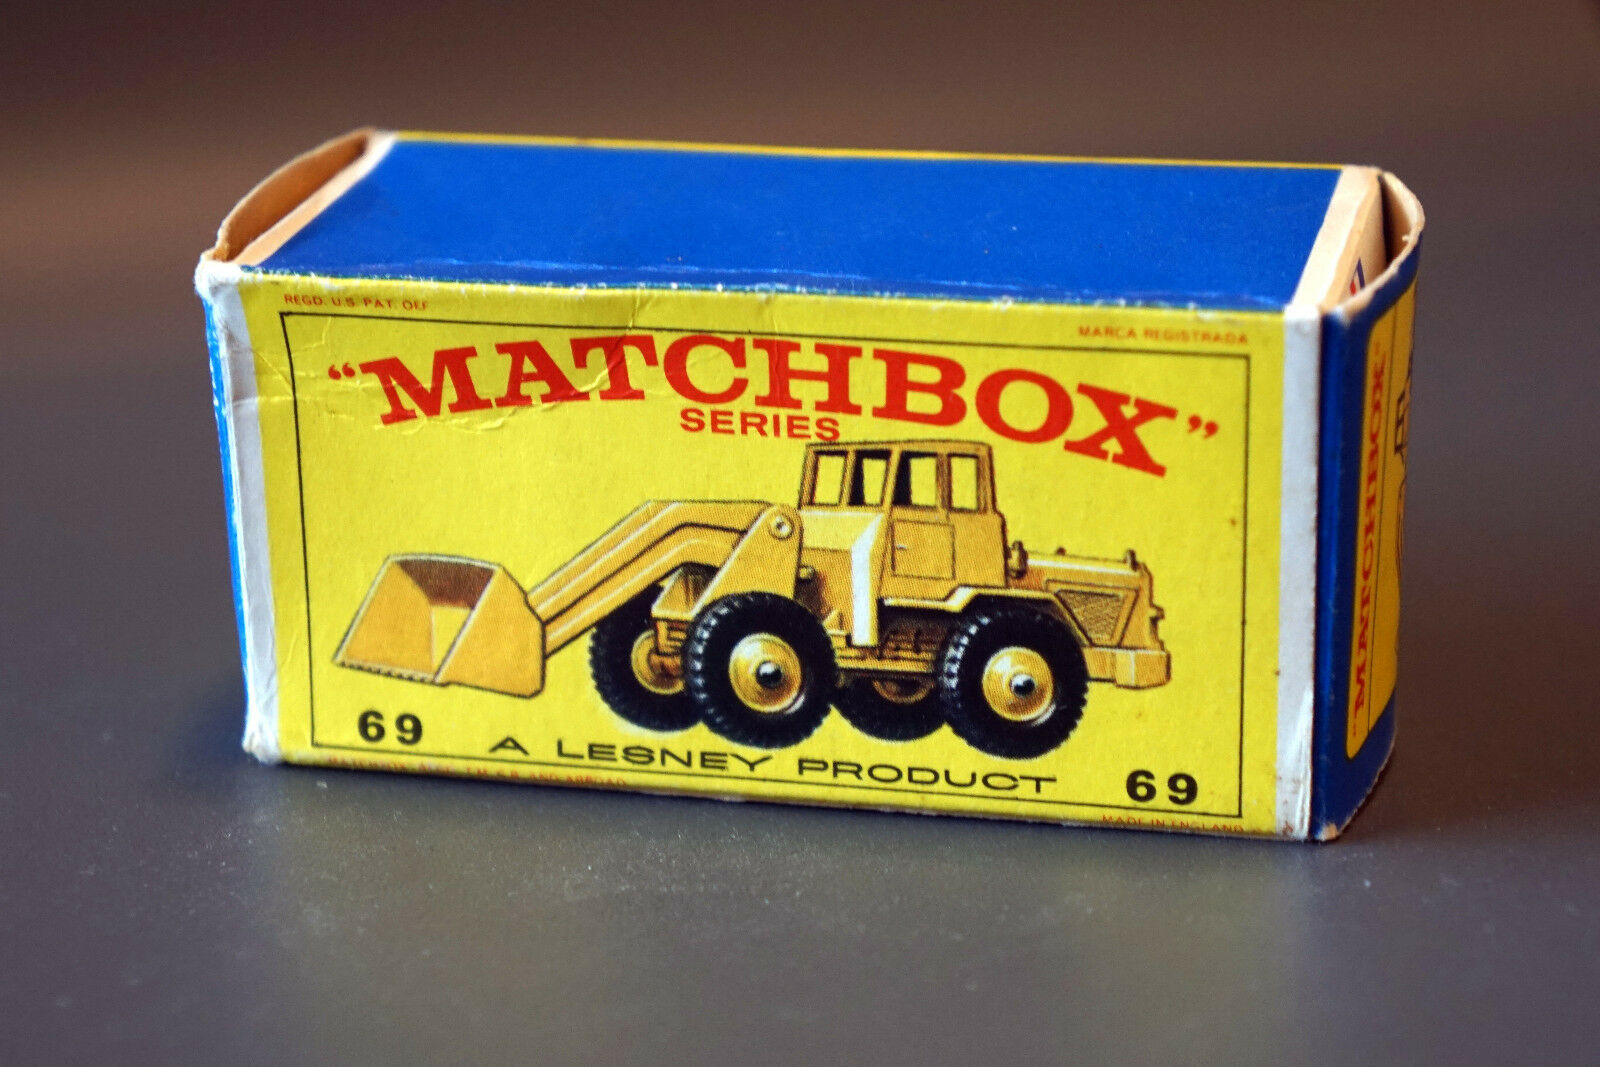 compra limitada Matchbox Lesney RW no 69b tractor Shovel (Hatra) con con con caja  compras en linea